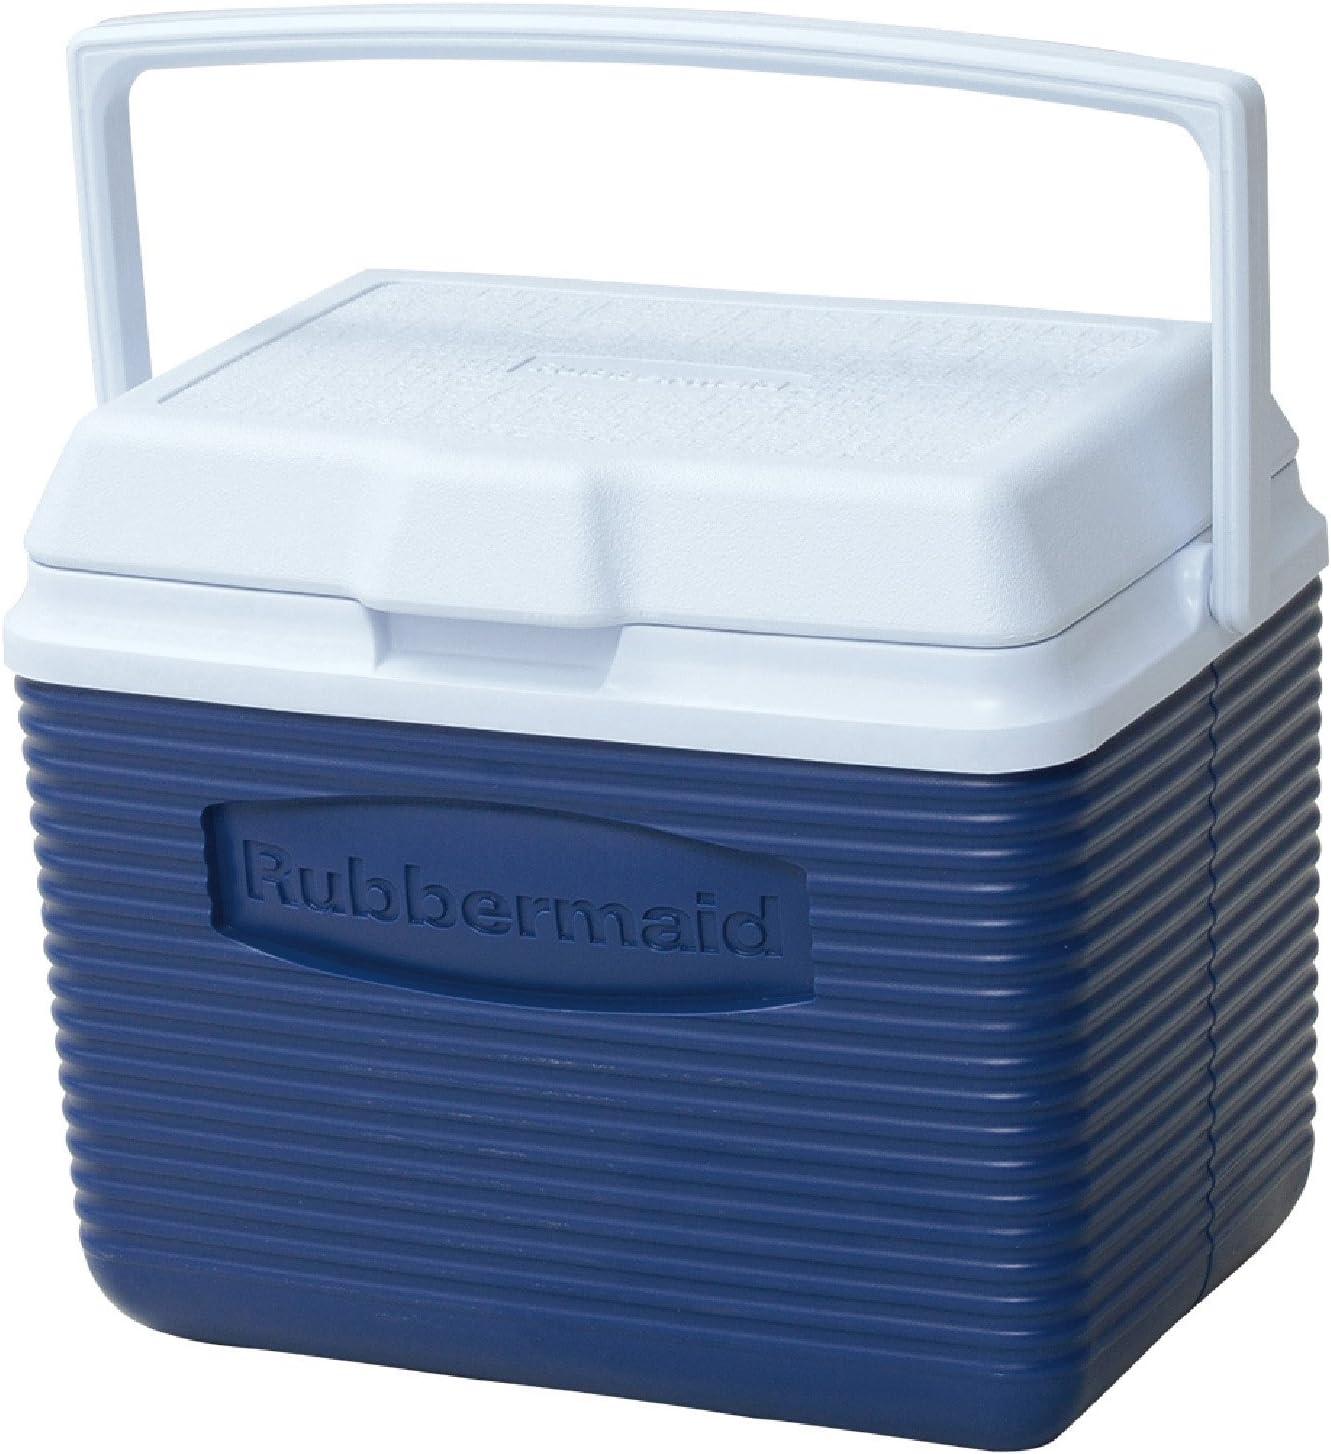 Rubbermaid Cooler, 10 Quart, Blue FG2A1104MODBL